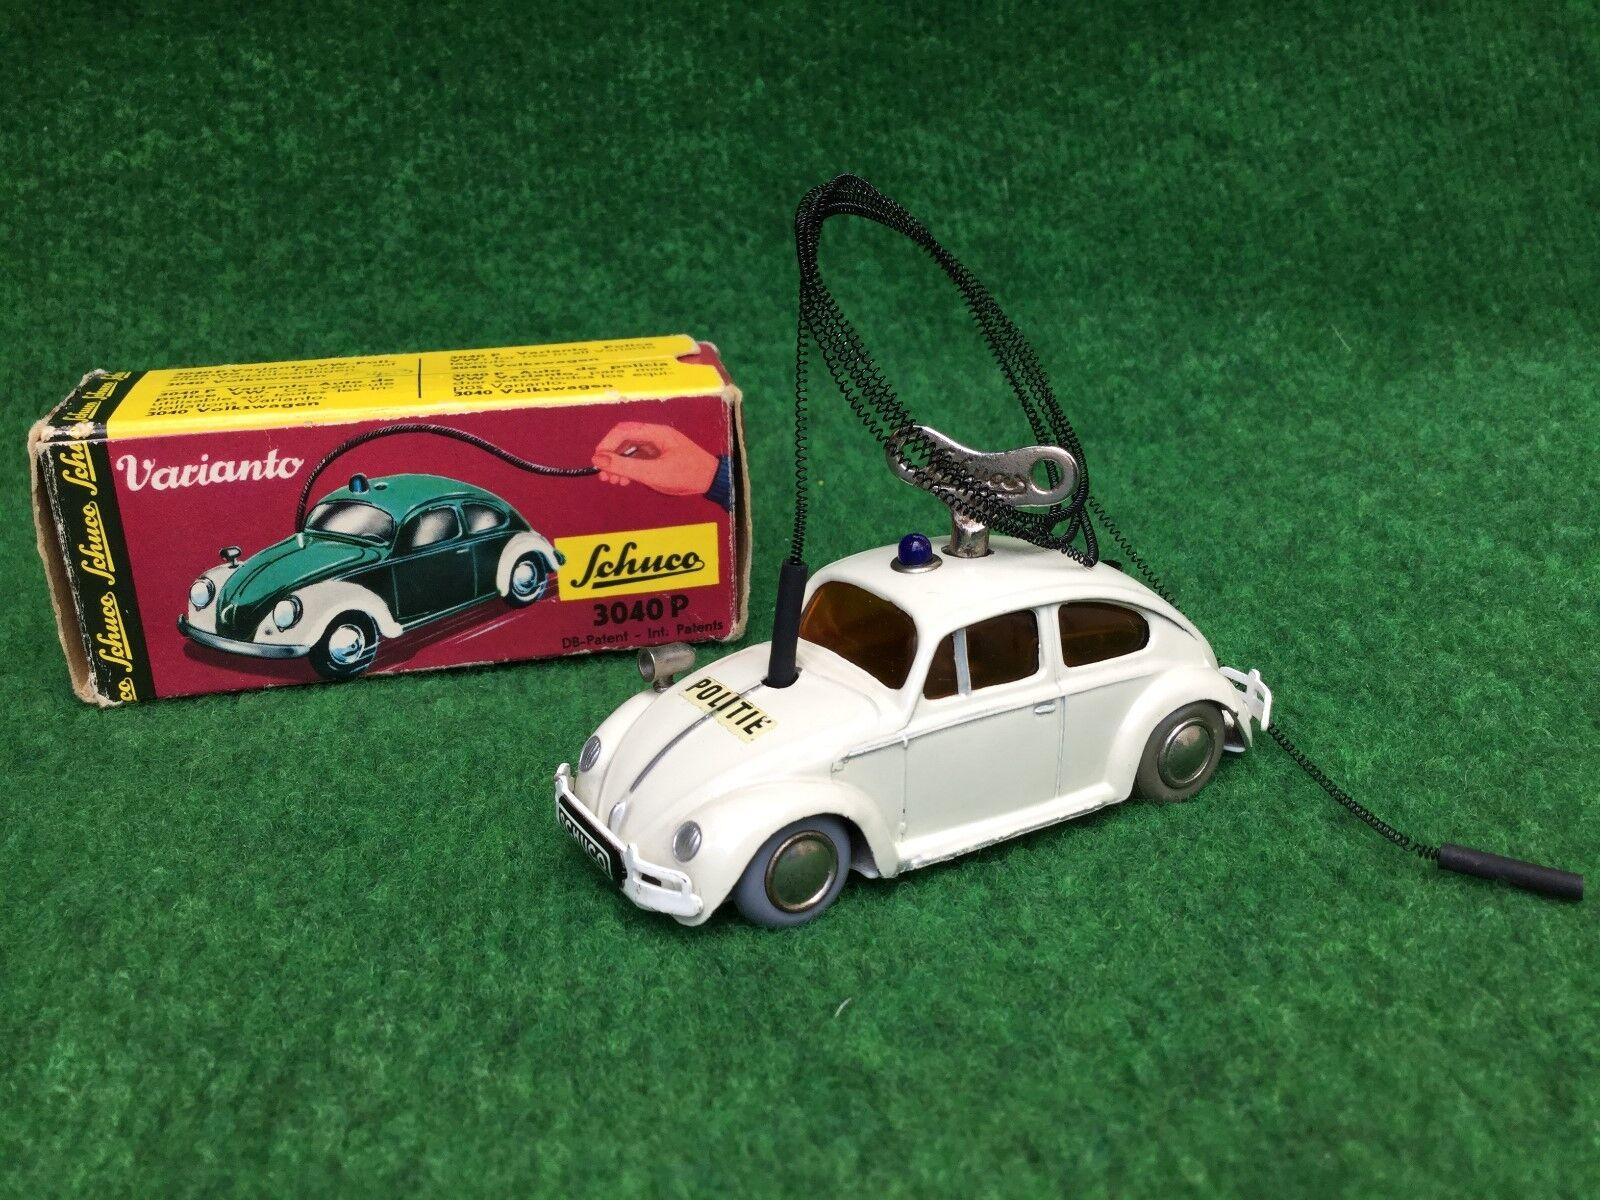 Schuco VARIANTO 3040 P VW Beetle Beetle Police OVP